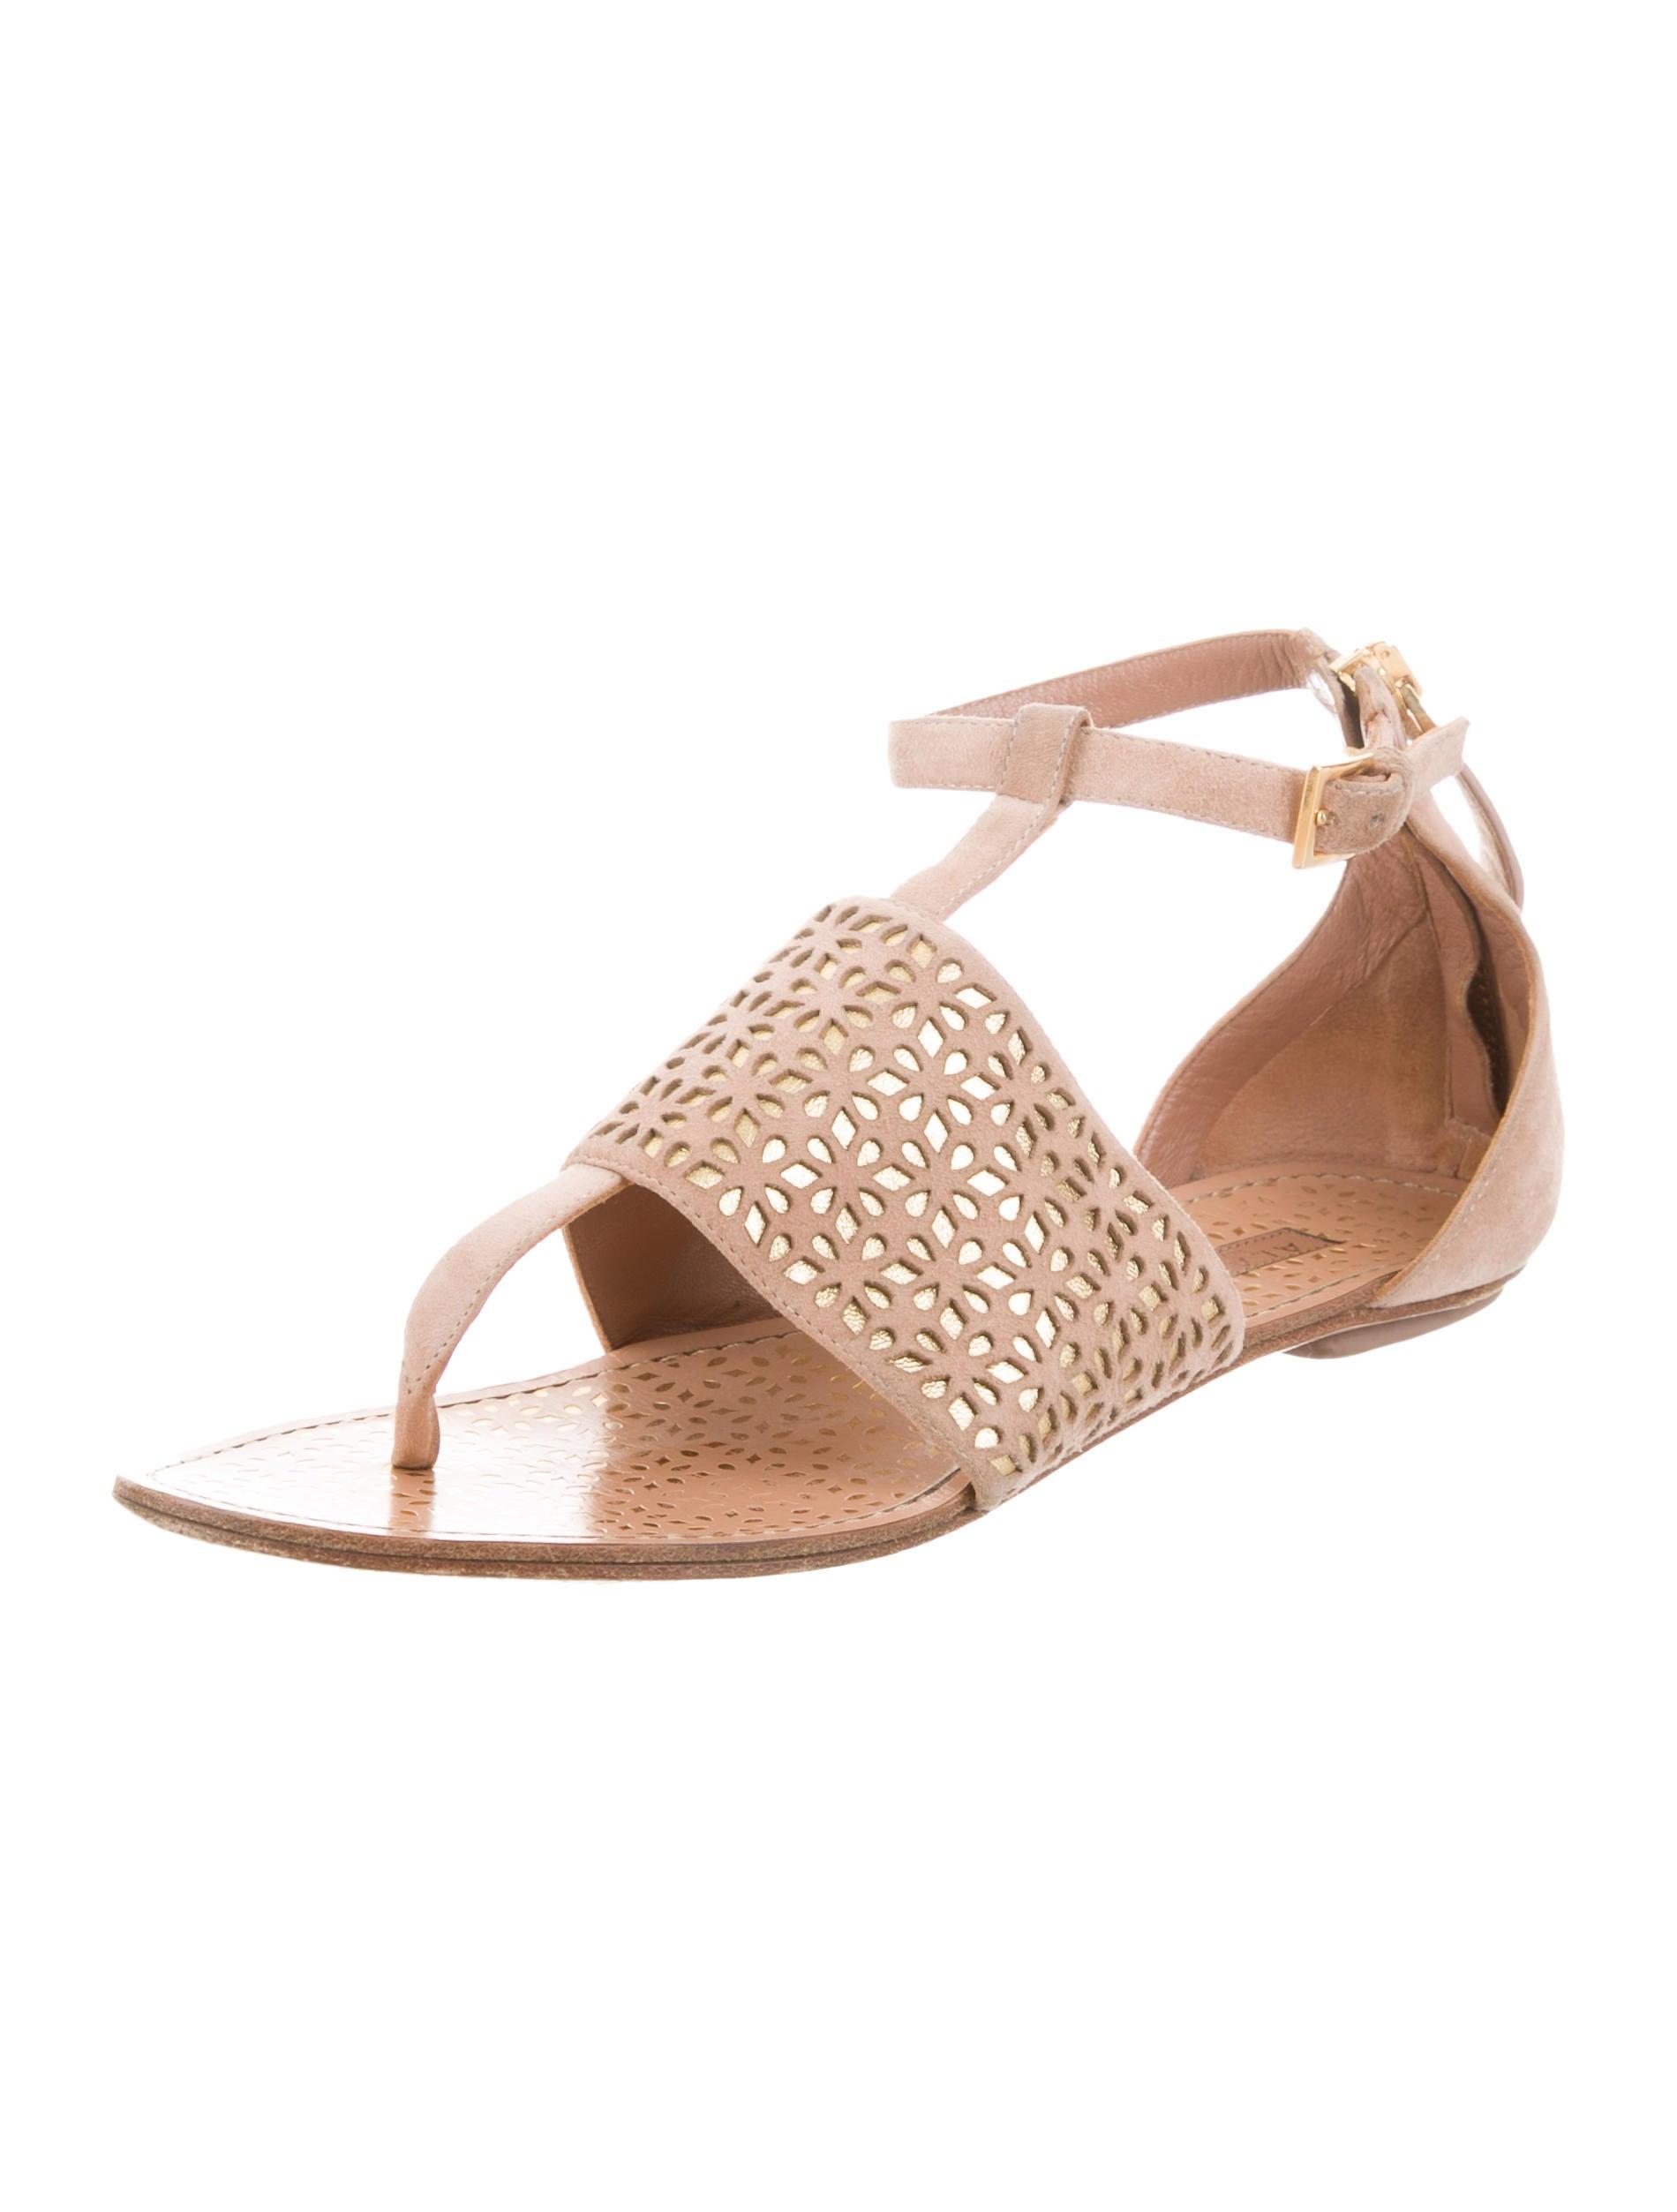 Alaïa Laser Cut Thong Sandals cheap sale footlocker pictures cNeRkOn